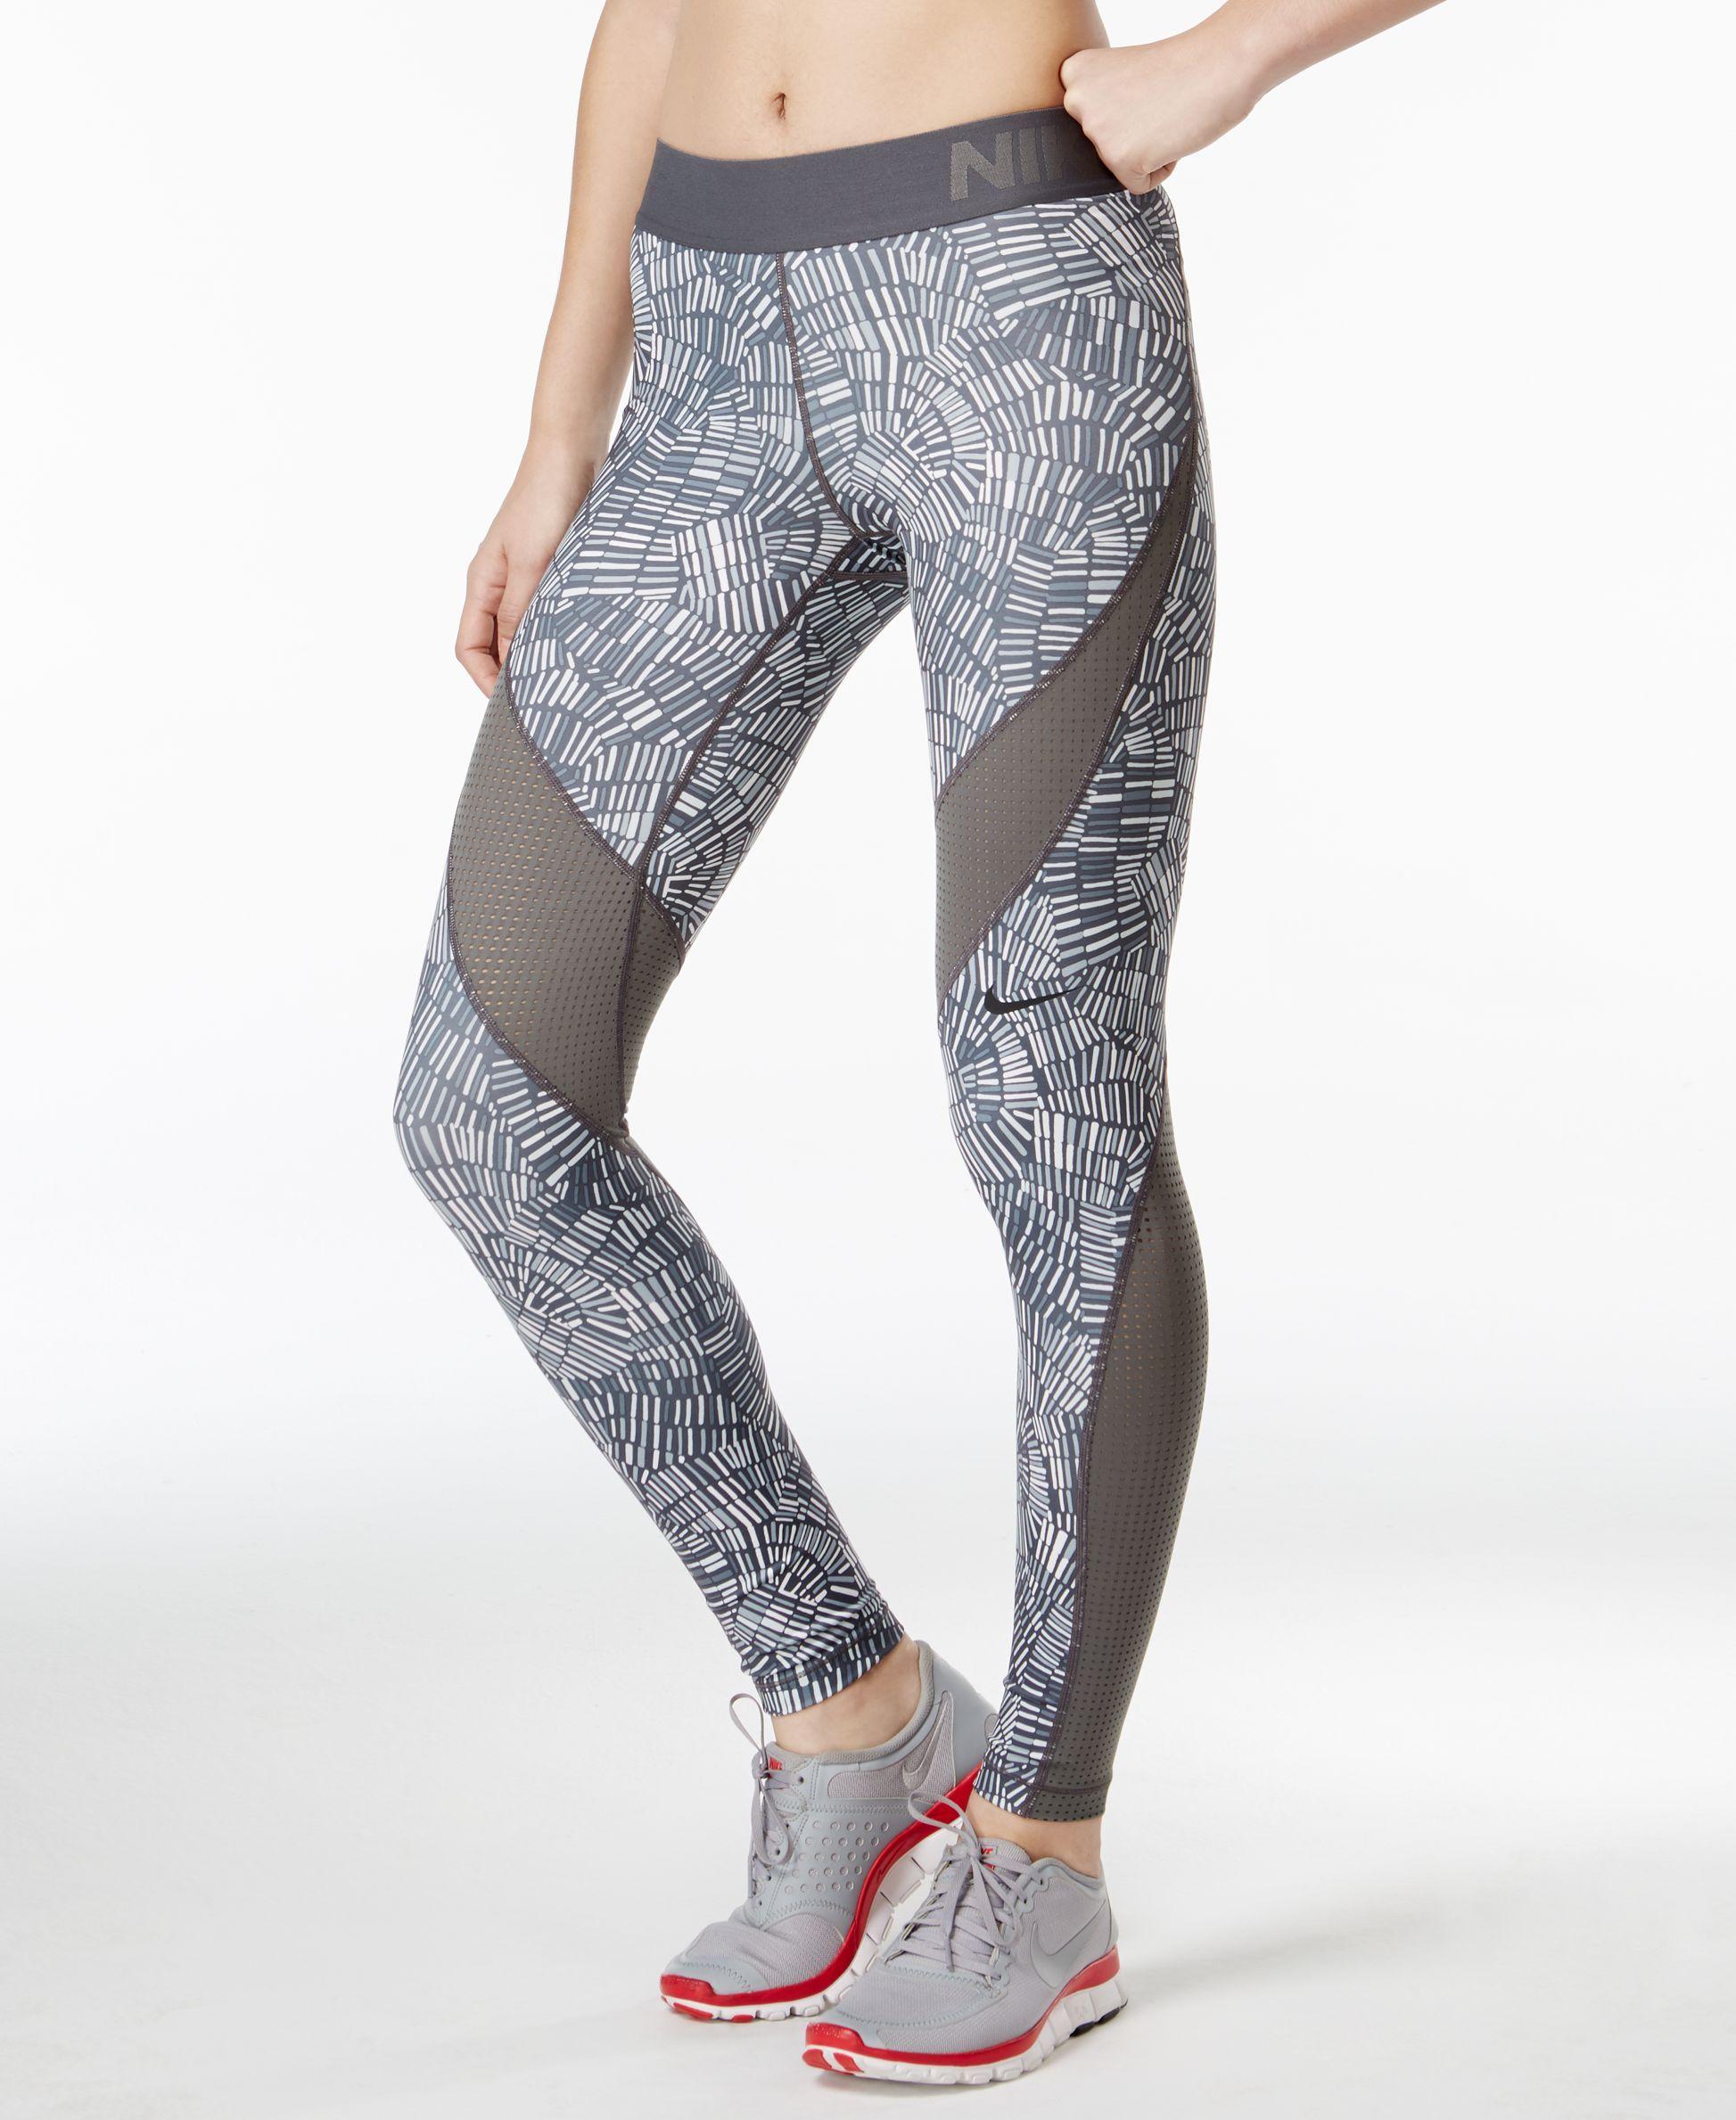 official photos d059d 85b4b Nike Pro Hypercool Dri-fit Tidal Multi Print Leggings